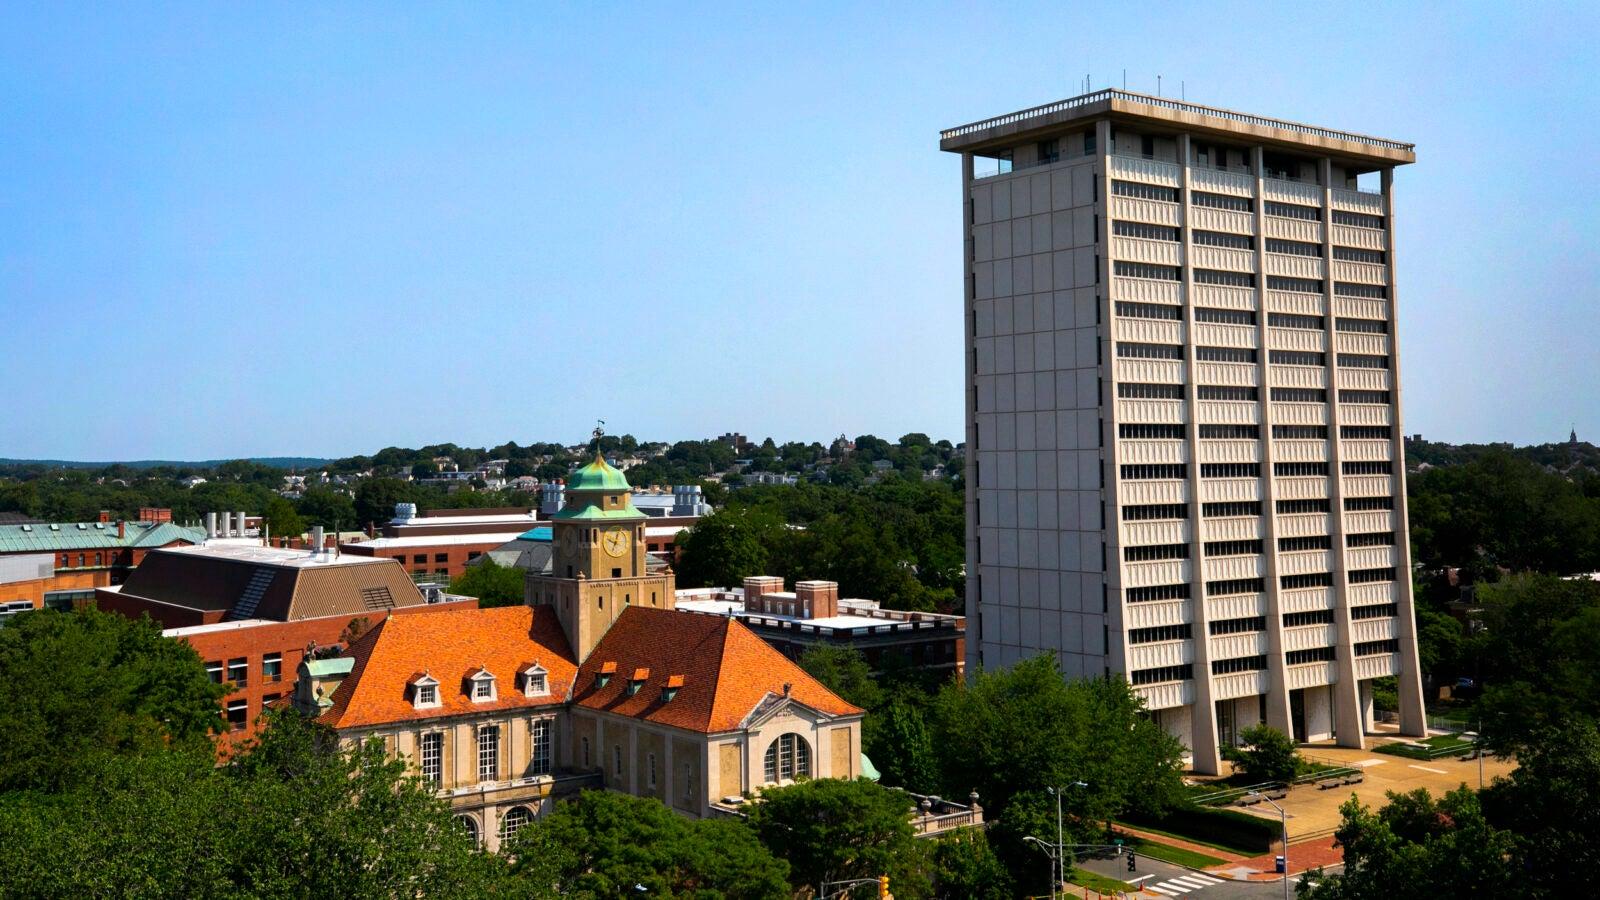 The Minda de Gunzburg Center for European Studies and William James Hall are pictured on Kirkland Street.